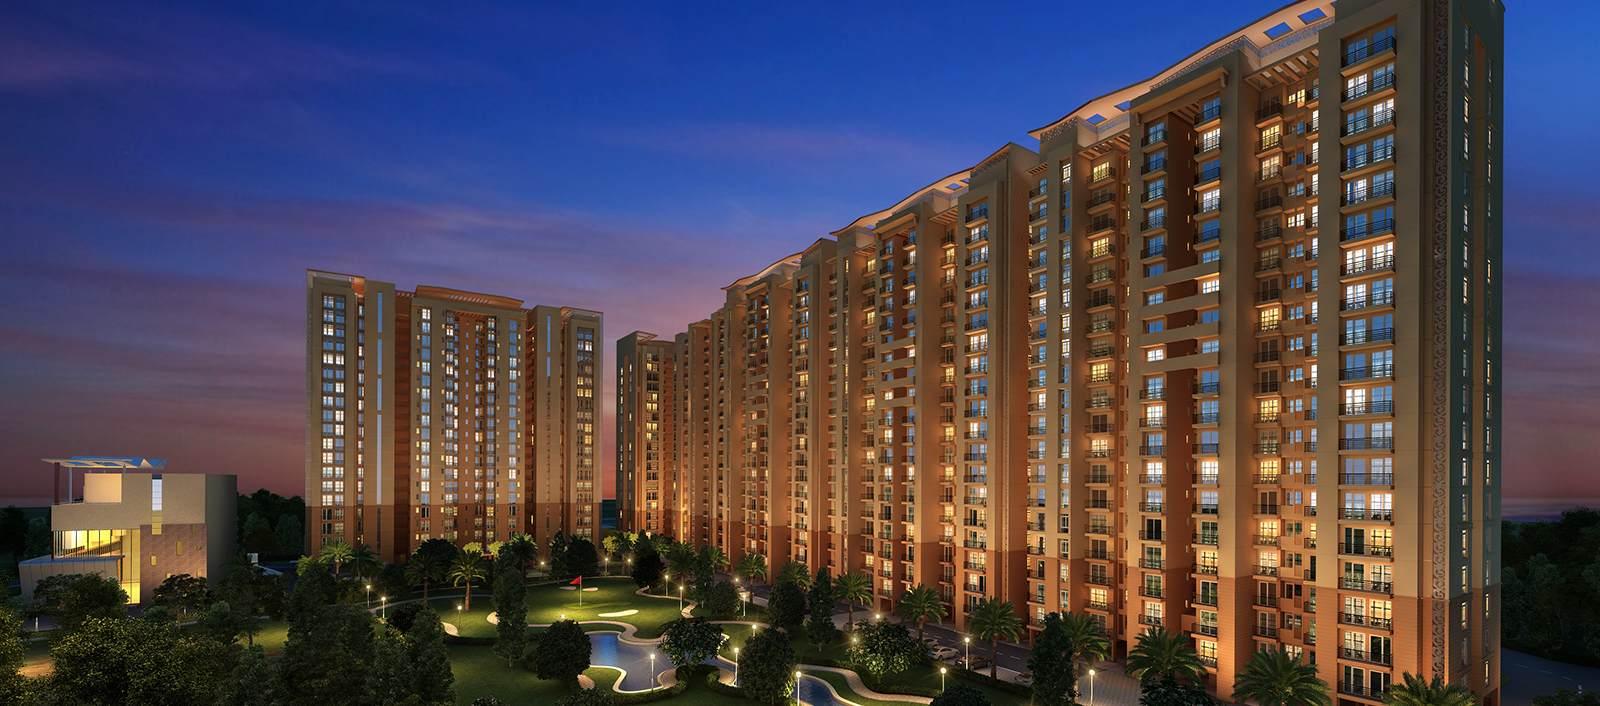 http://www.getsellproperty.com/builder/aditya/urban-homes/header.jpg